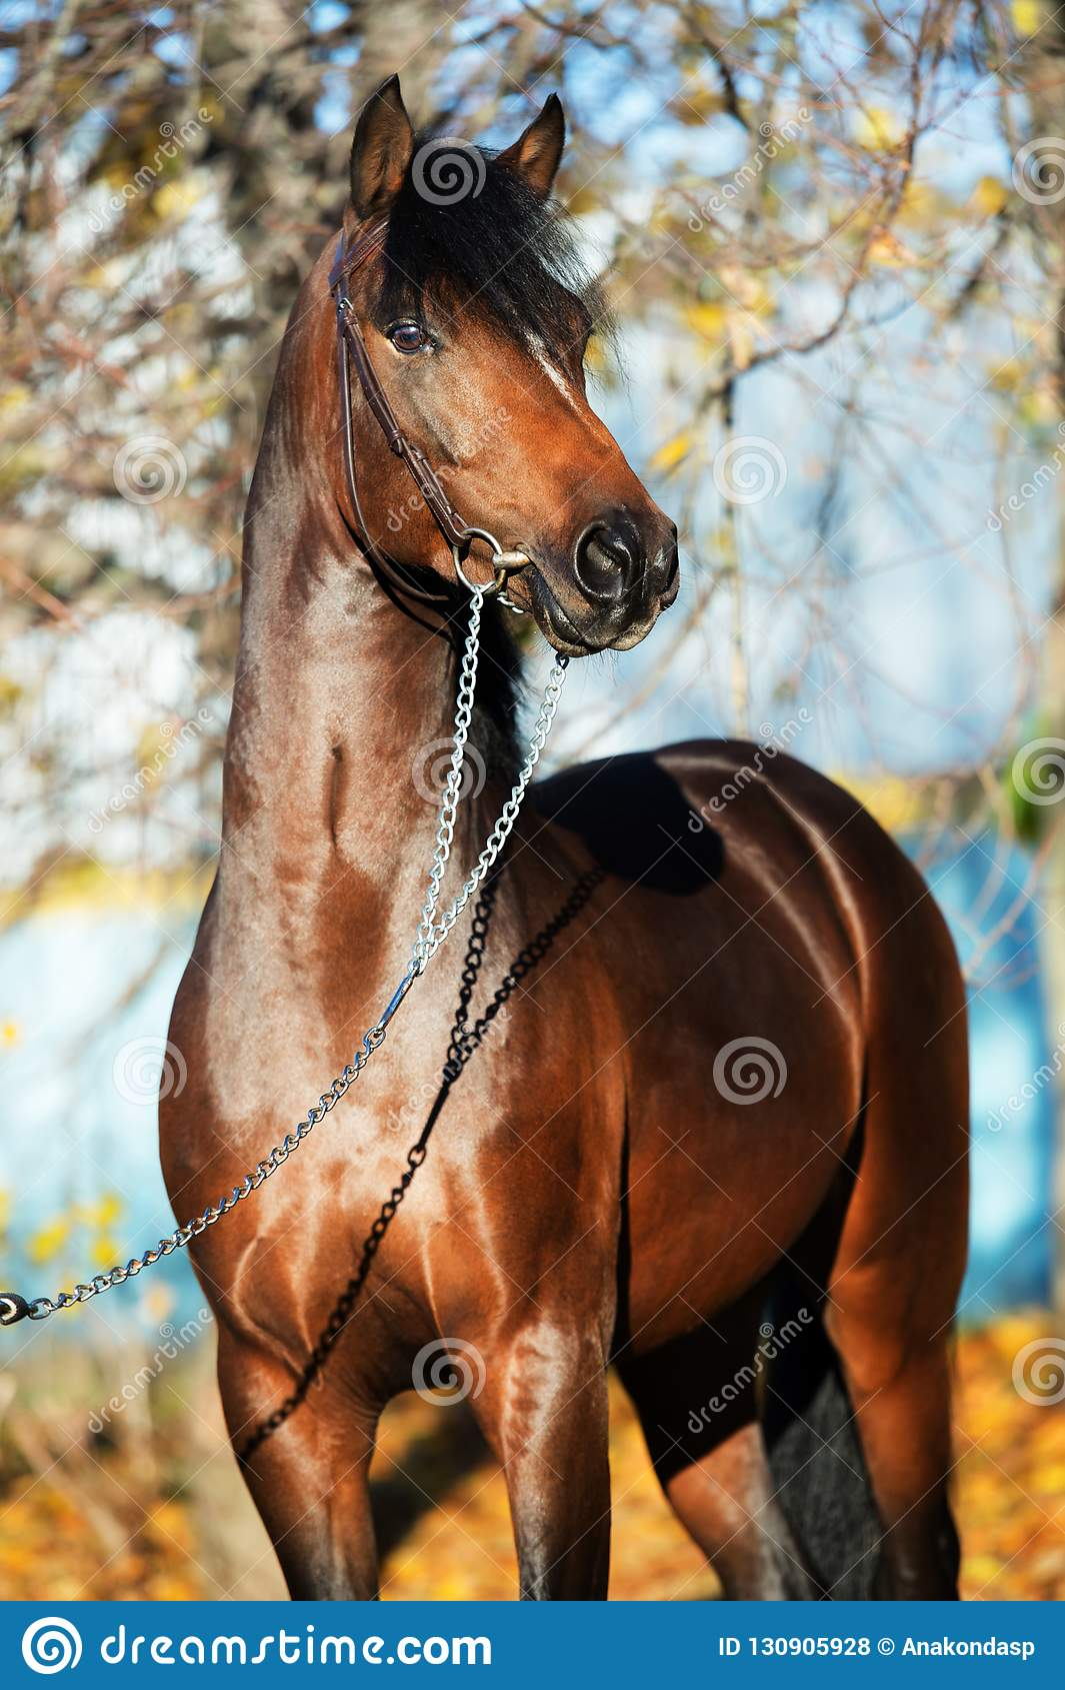 Dark bay sportive welsh pony stallion posing near autumn trees